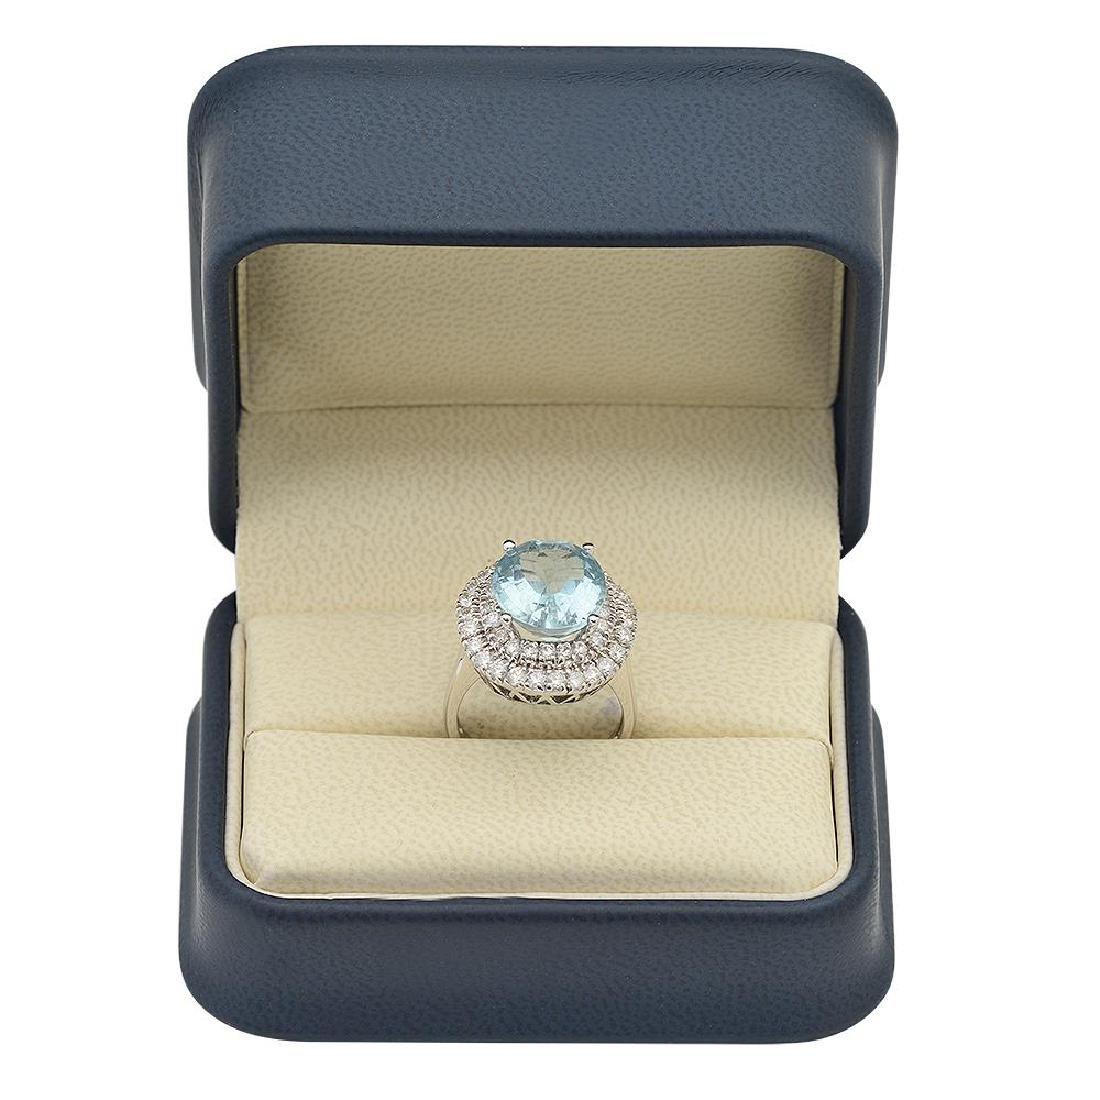 14K Gold 6.88ct Aquamarine 1.65ct Diamond Ring - 4